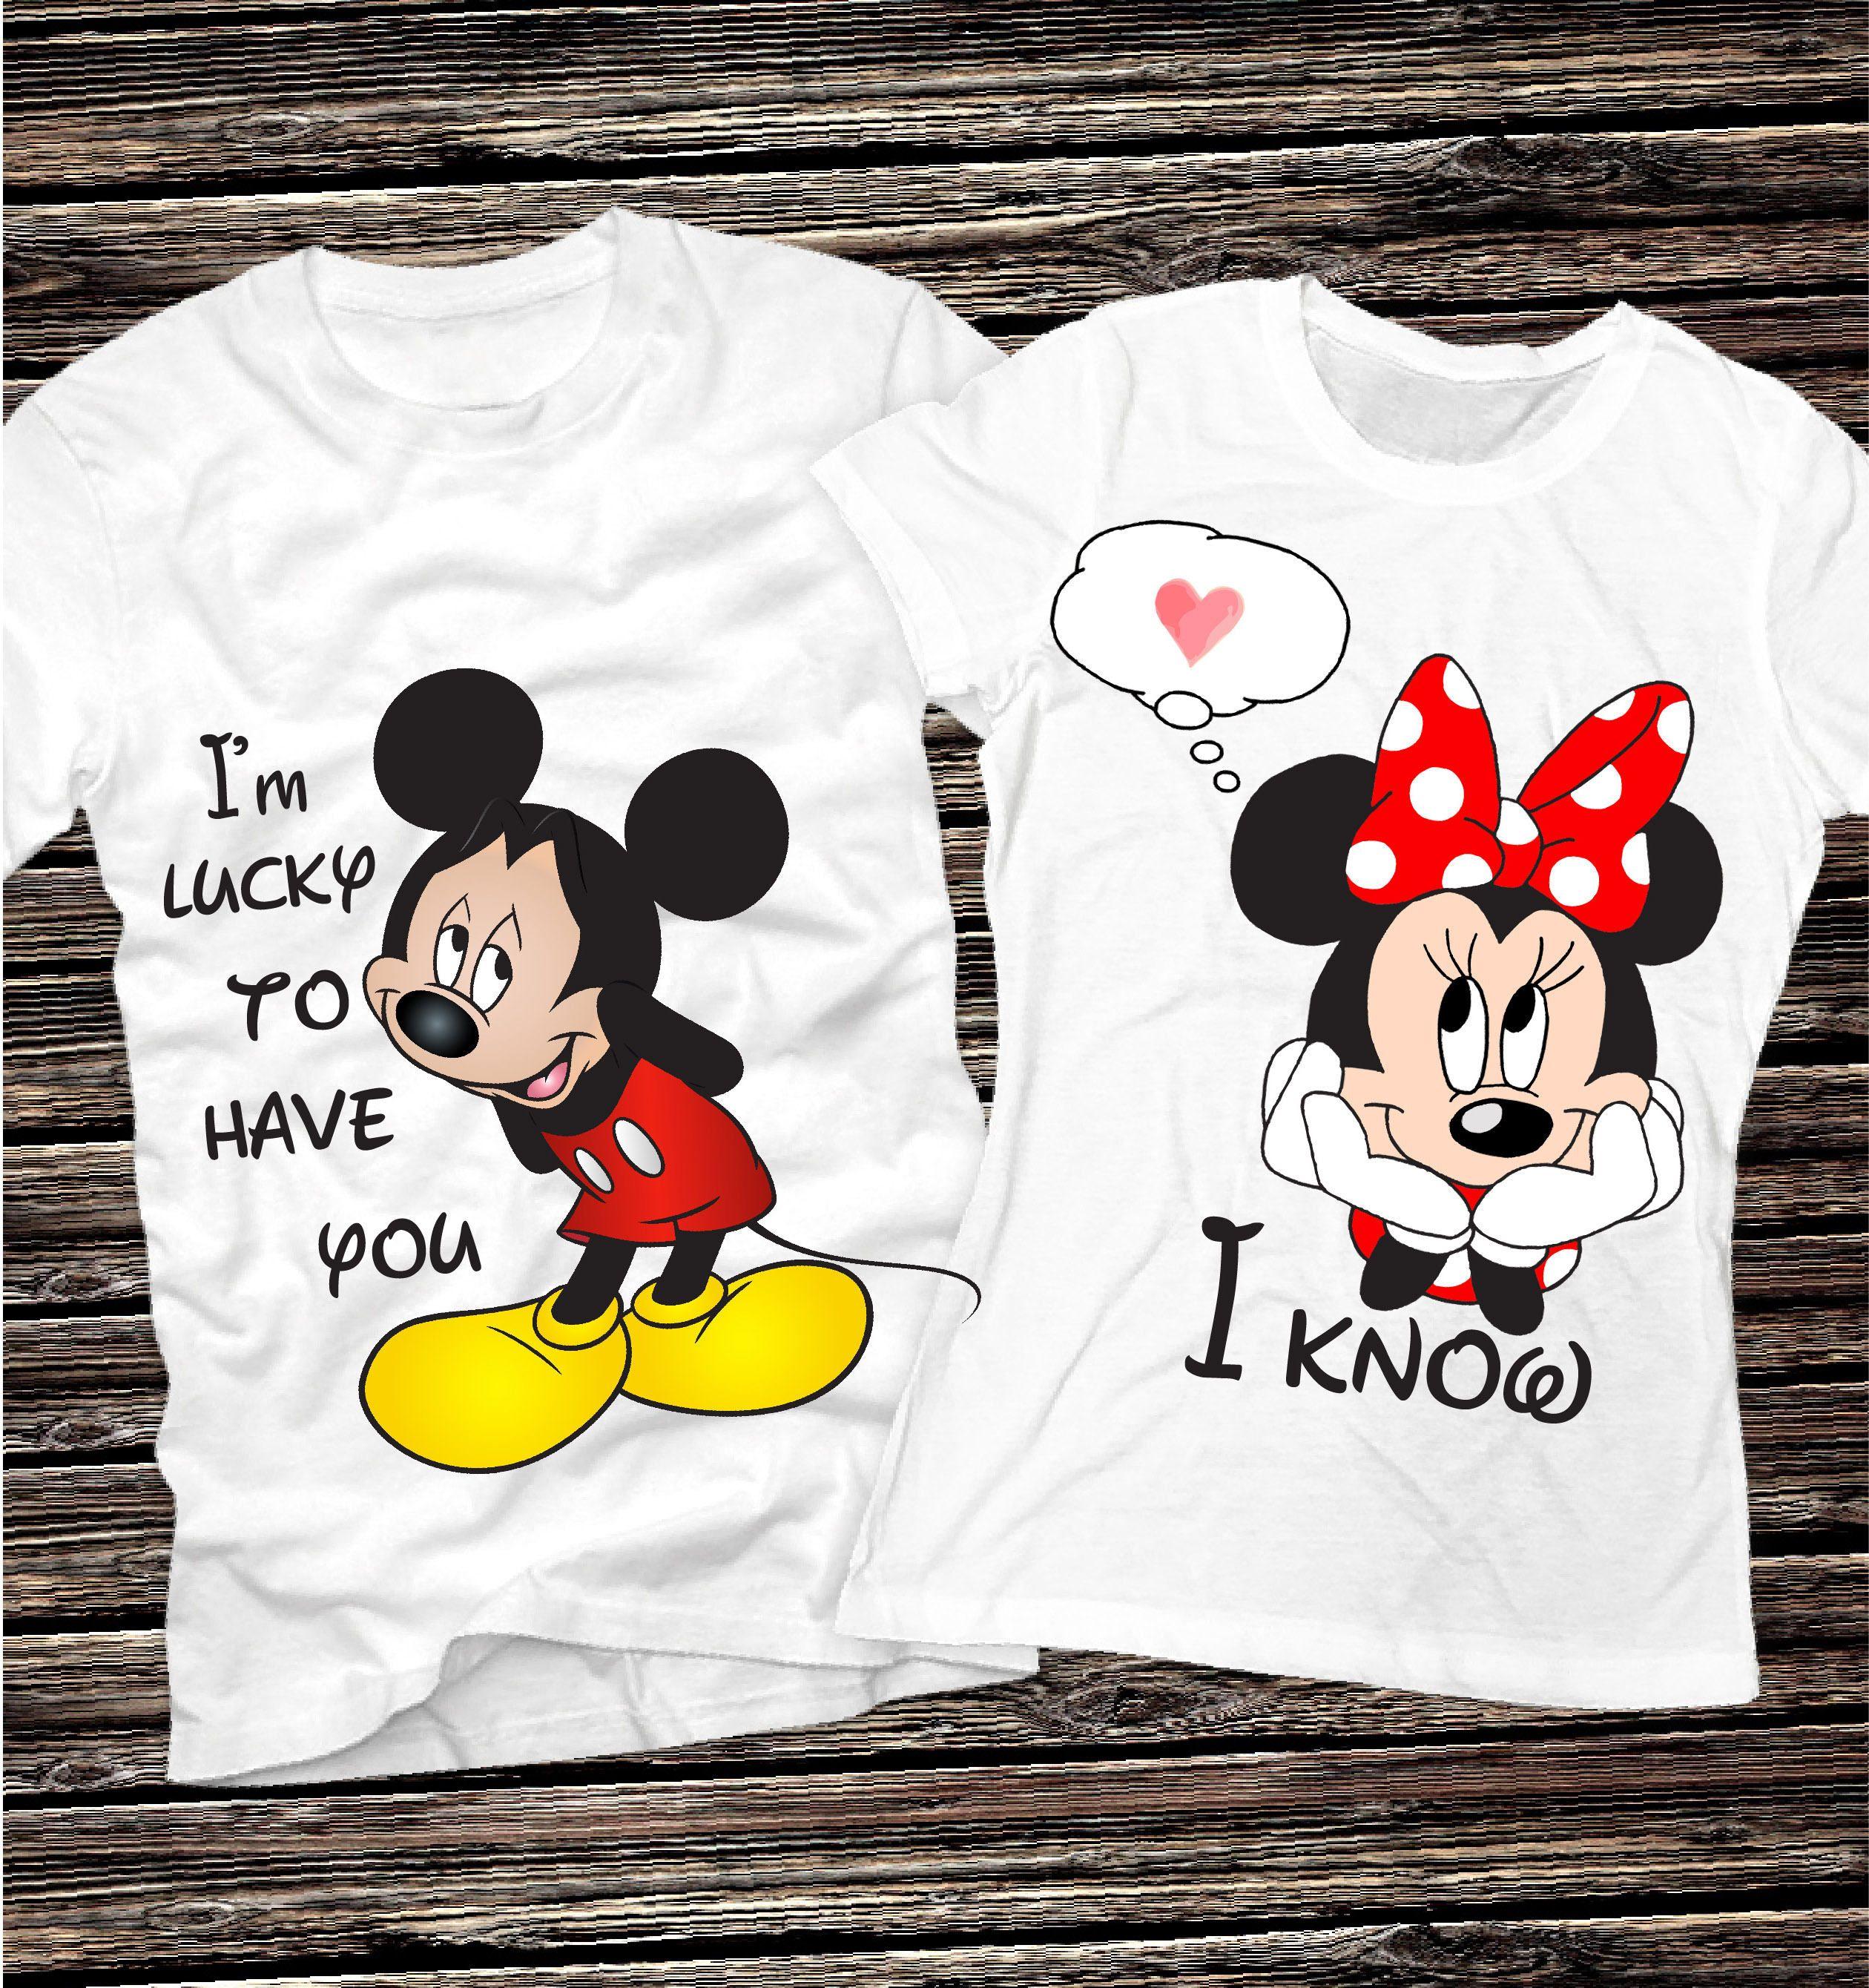 S Womens Disney Mickey Minnie Mouse Kiss Raglan Tee Shirt Valentine/'s T-Shirt